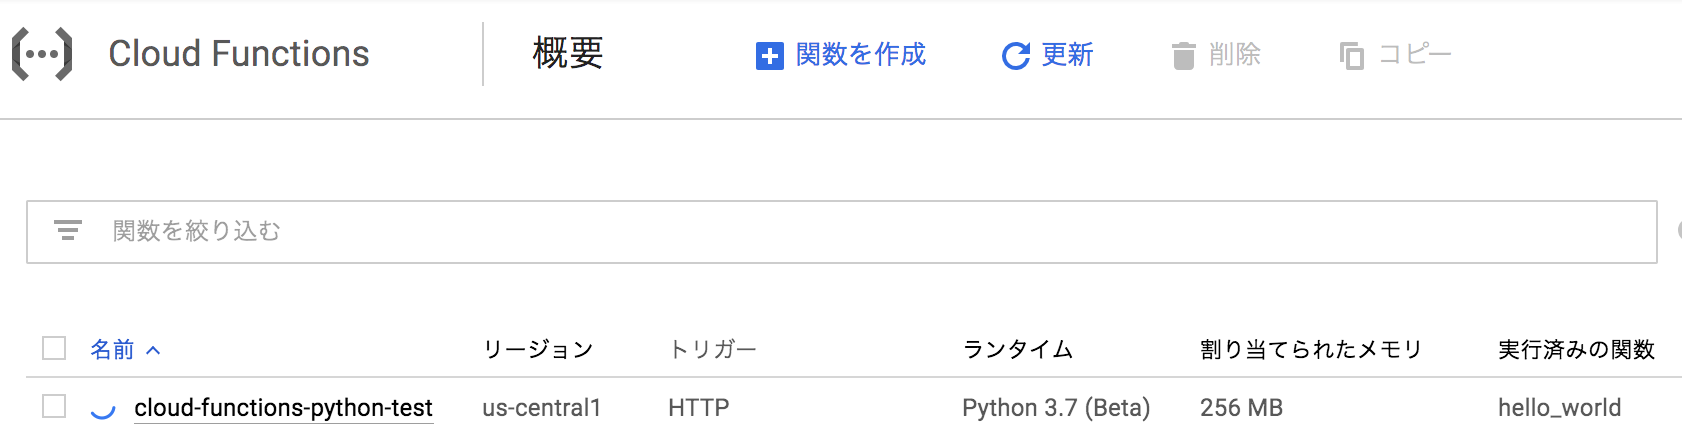 Cloud_Functions_関数作成中.png